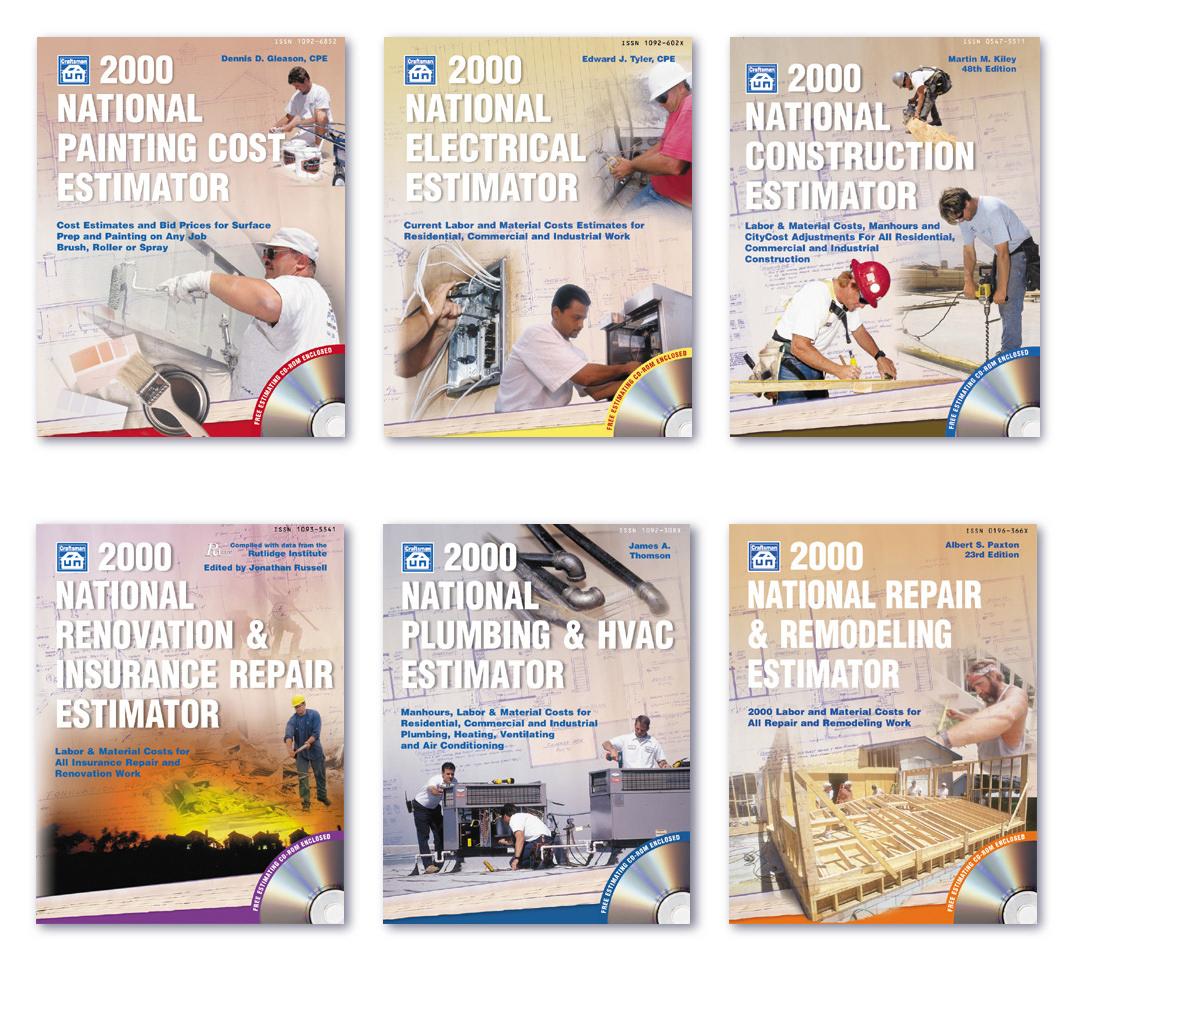 Merritt Voigtlander - 2000 Estimator Covers